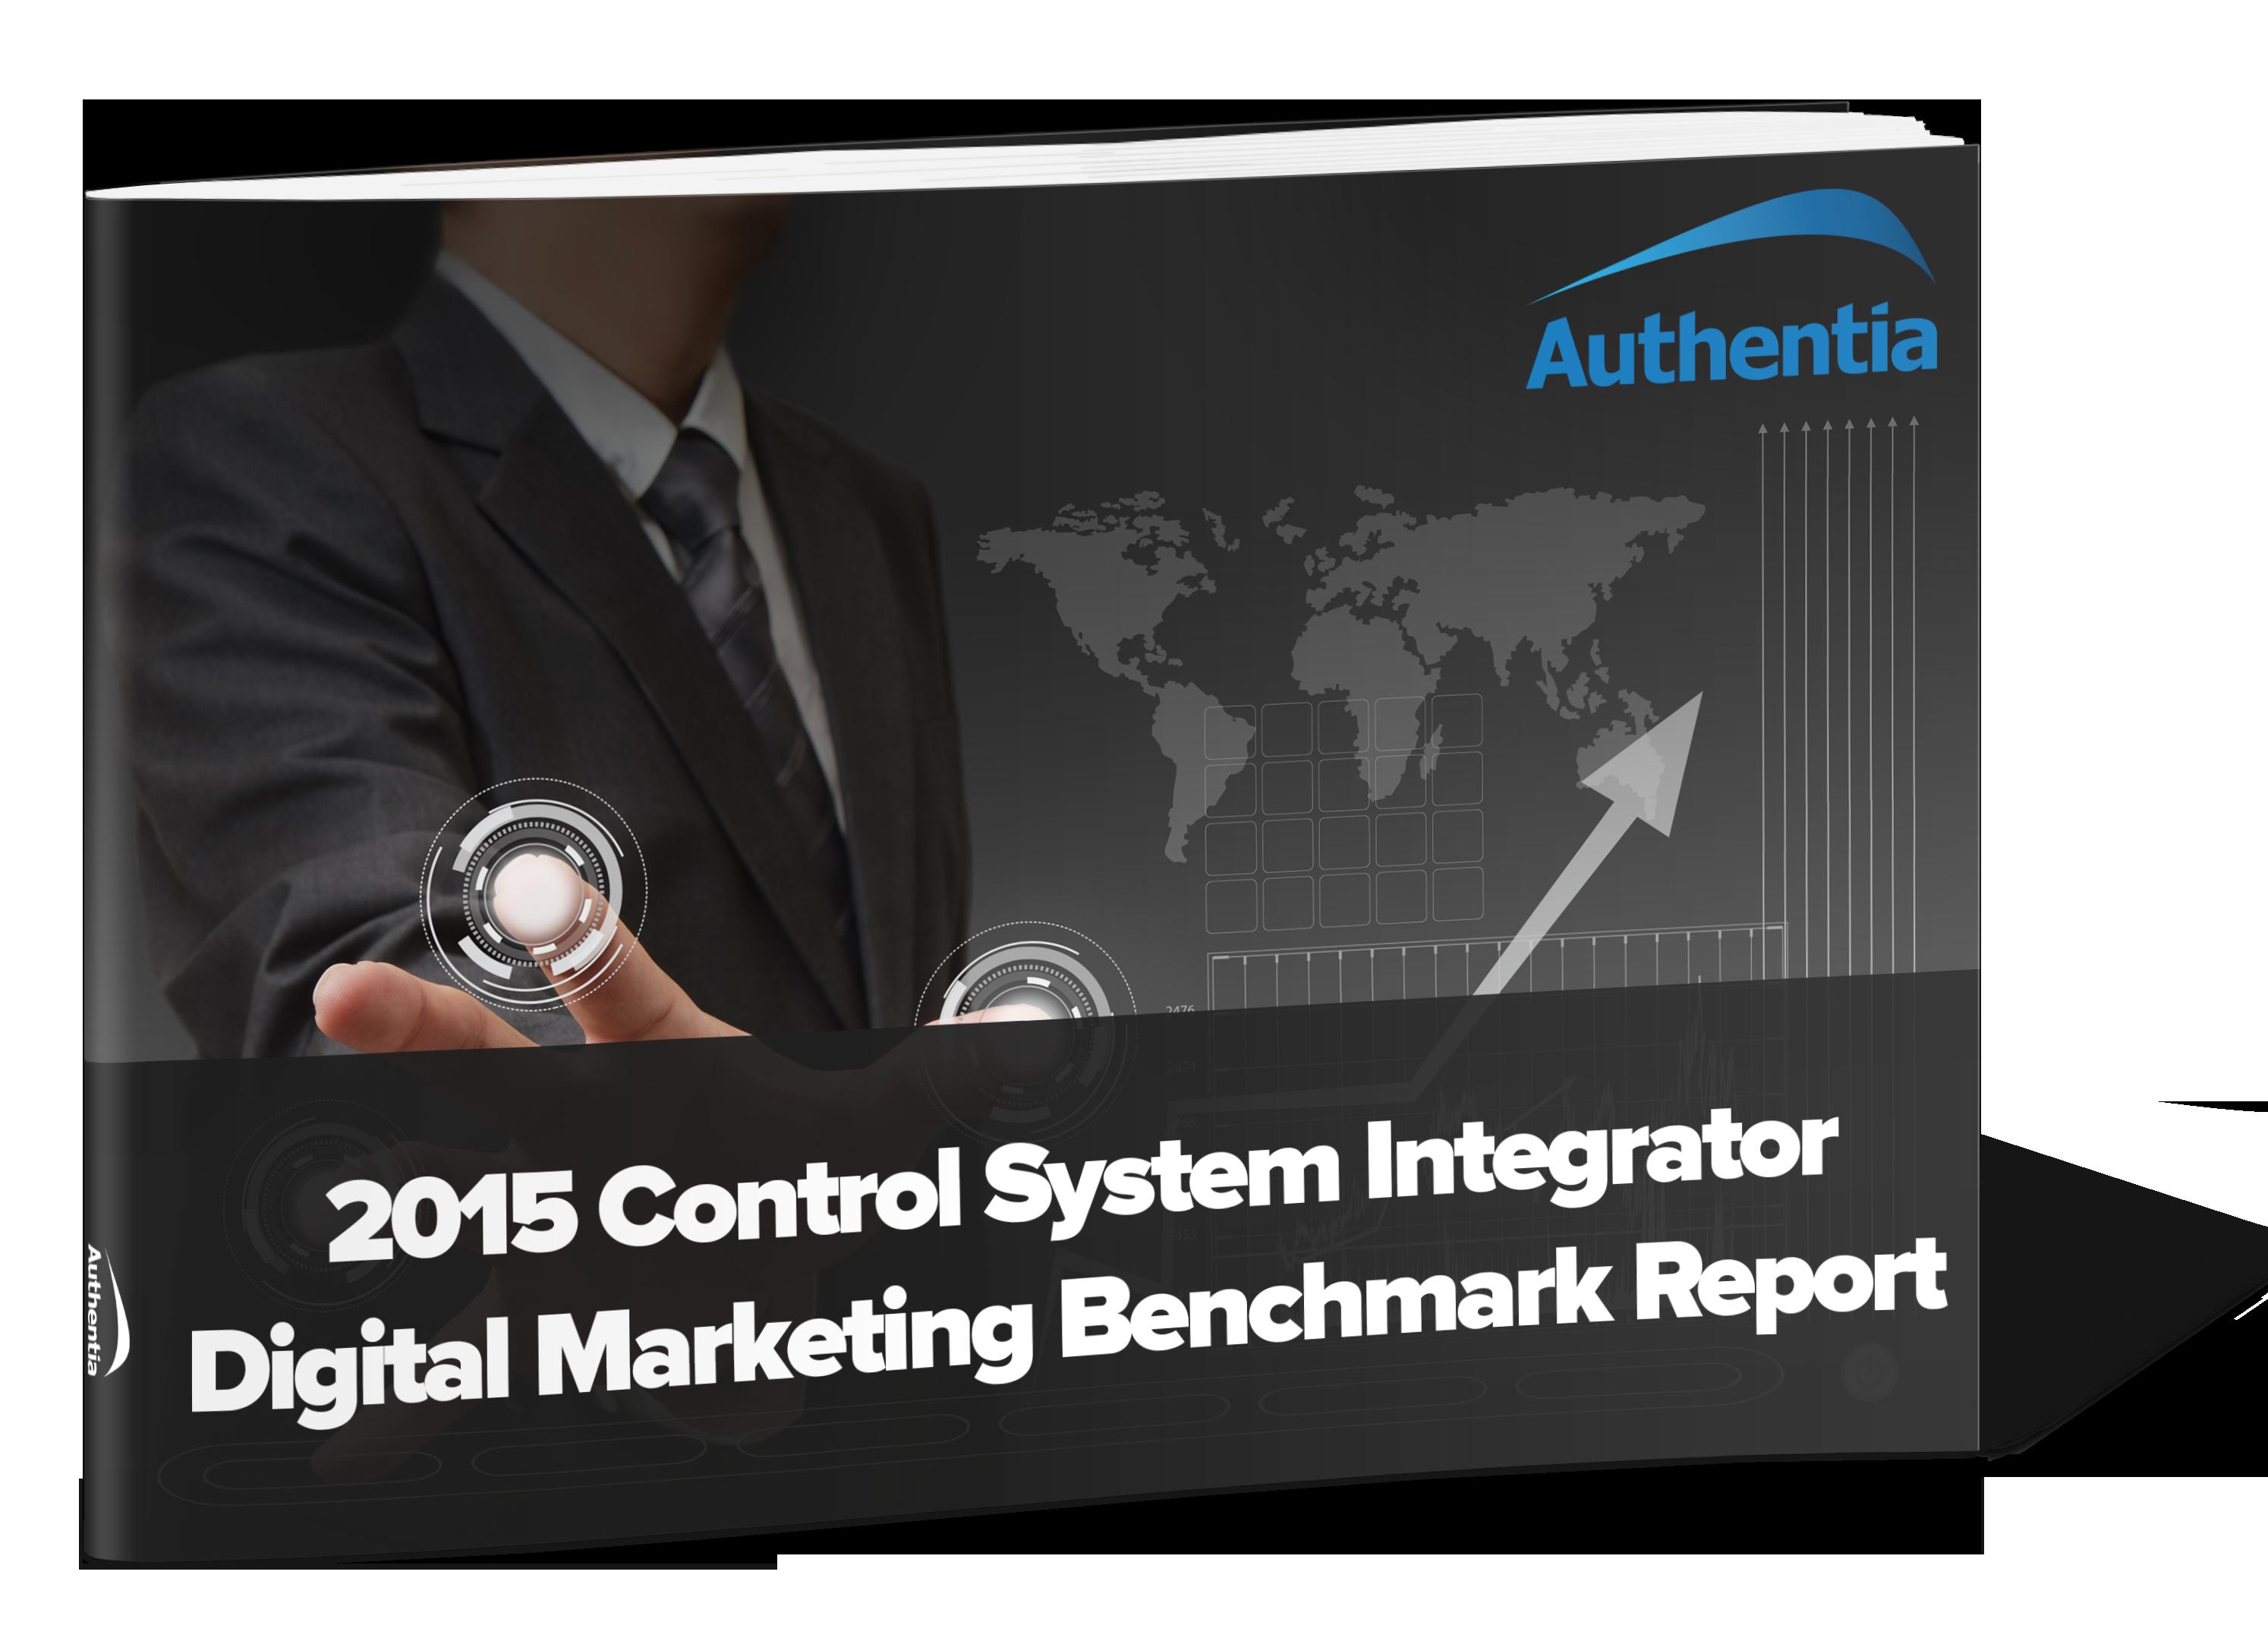 2015 Control System Integrators Digital Marketing Benchmark Report